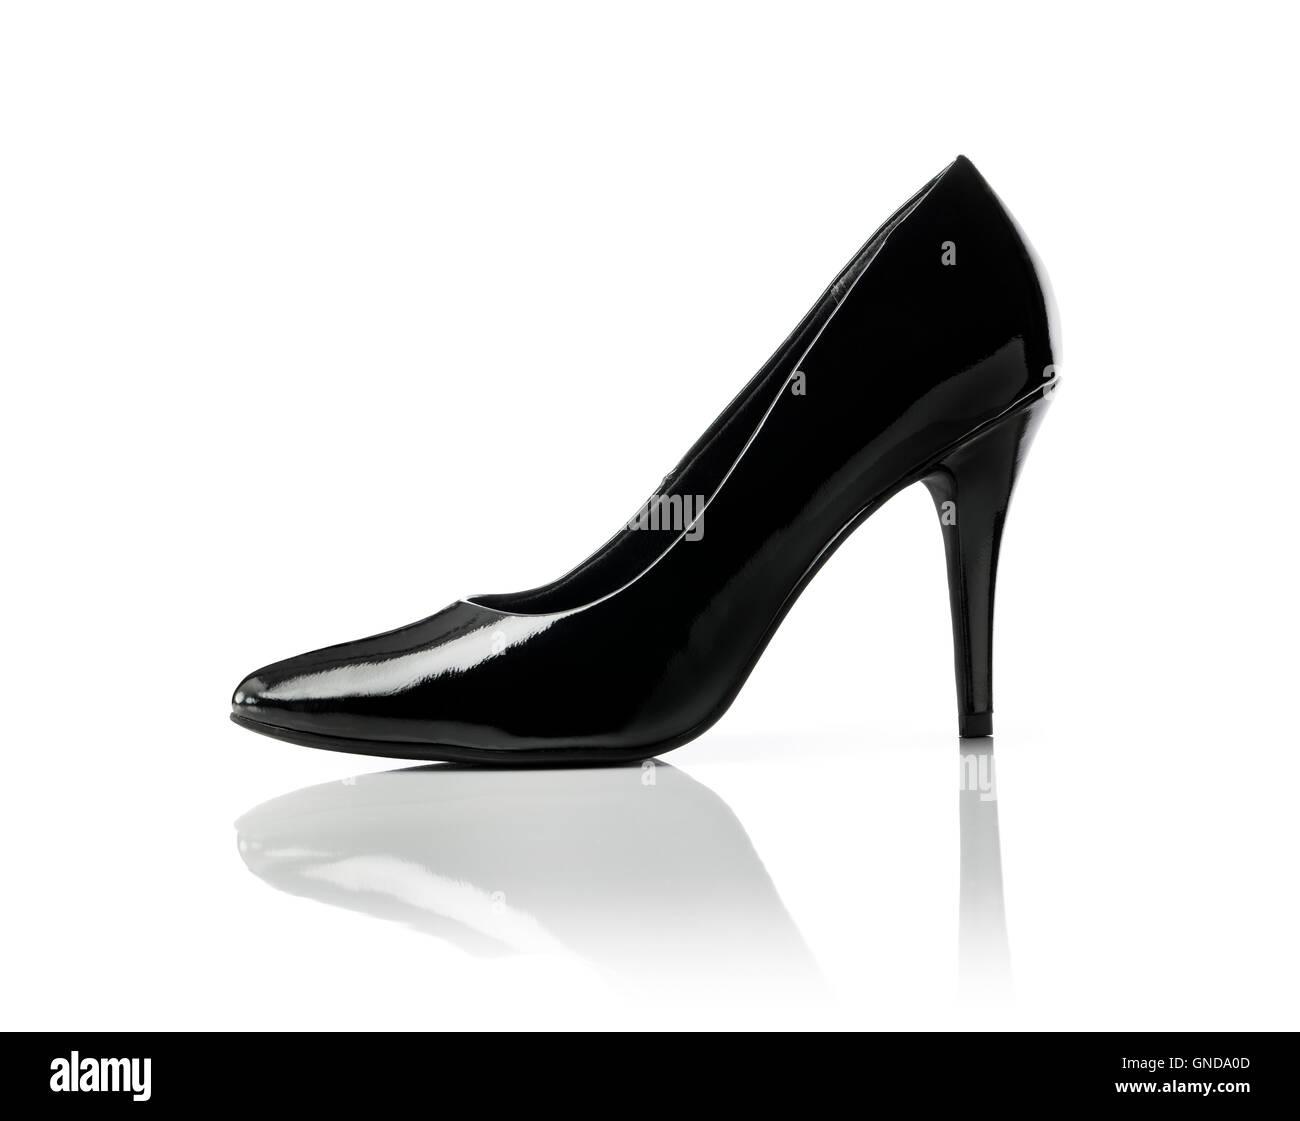 Negro brillante Stiletto talón mujer zapato bomba en blanco. Imagen De Stock 12d12dace11d